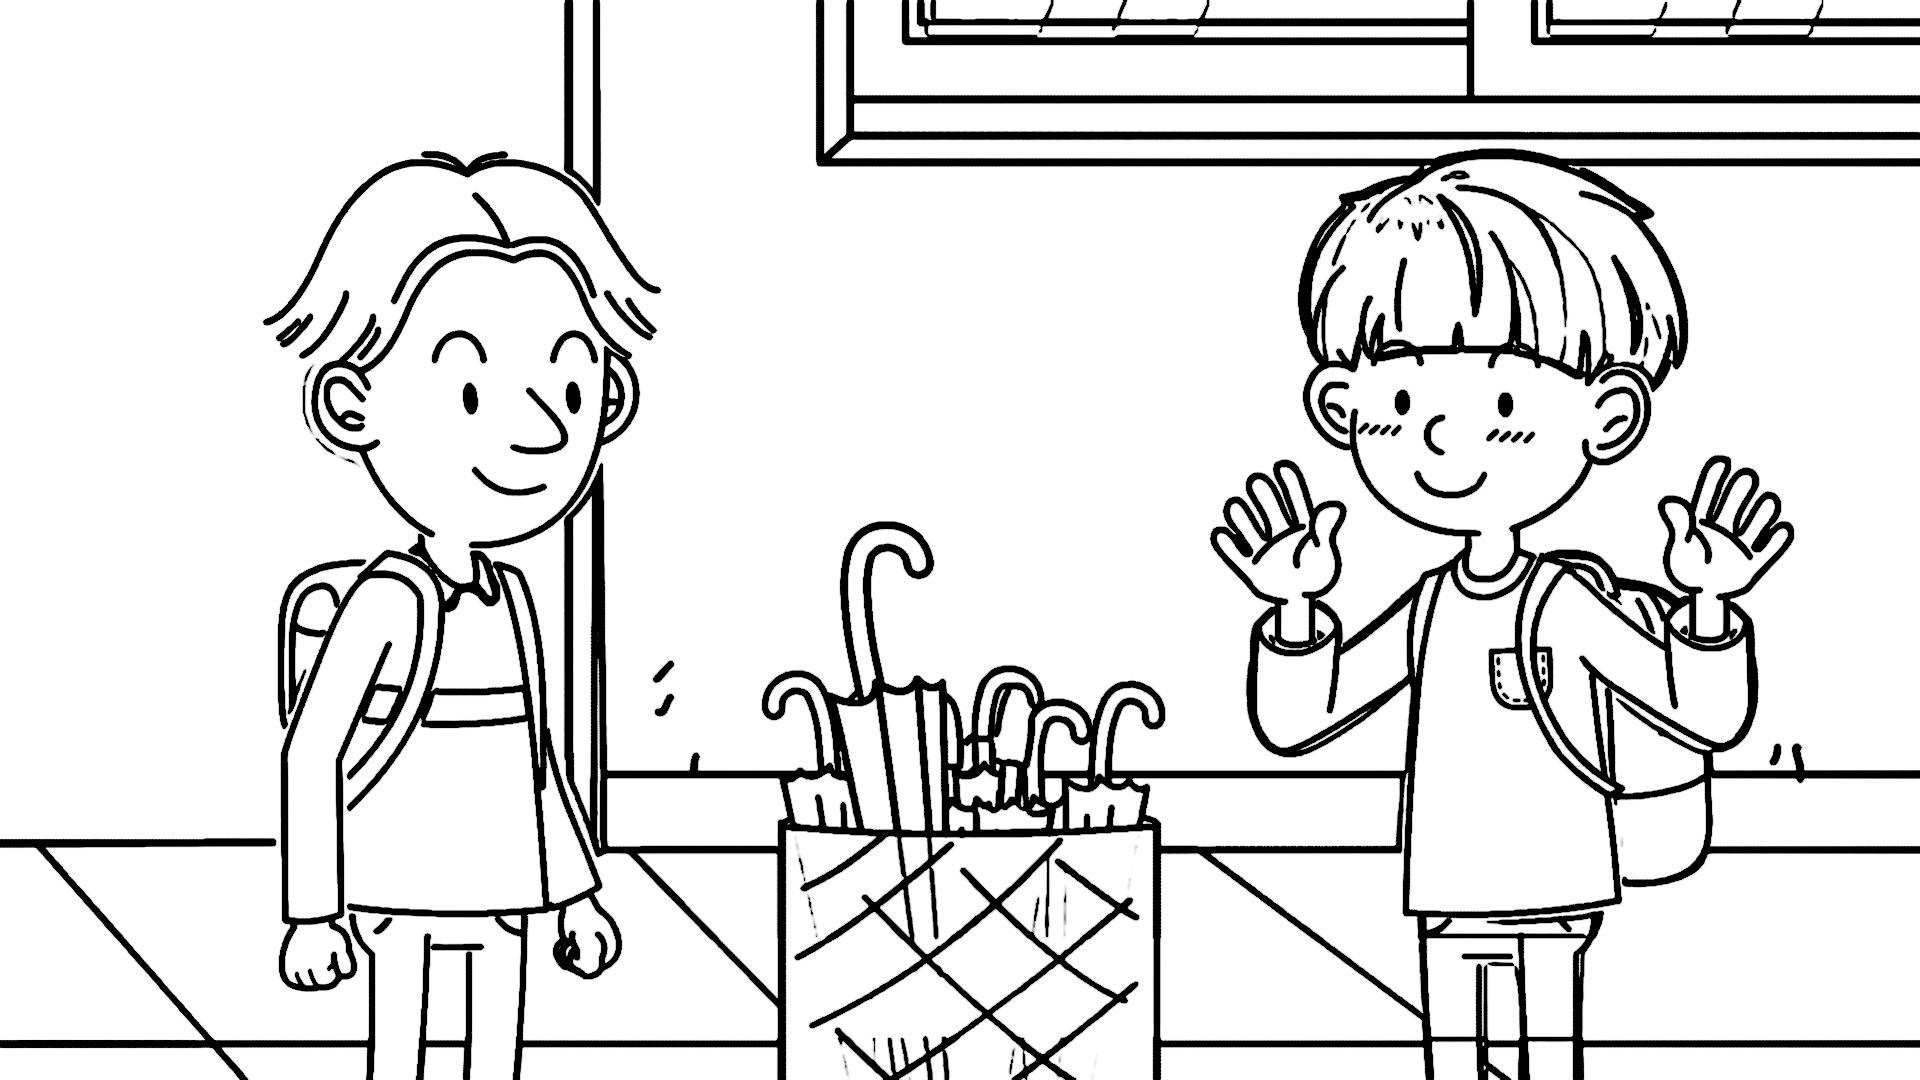 Speaking Cartoon Kids Coloring Page 31